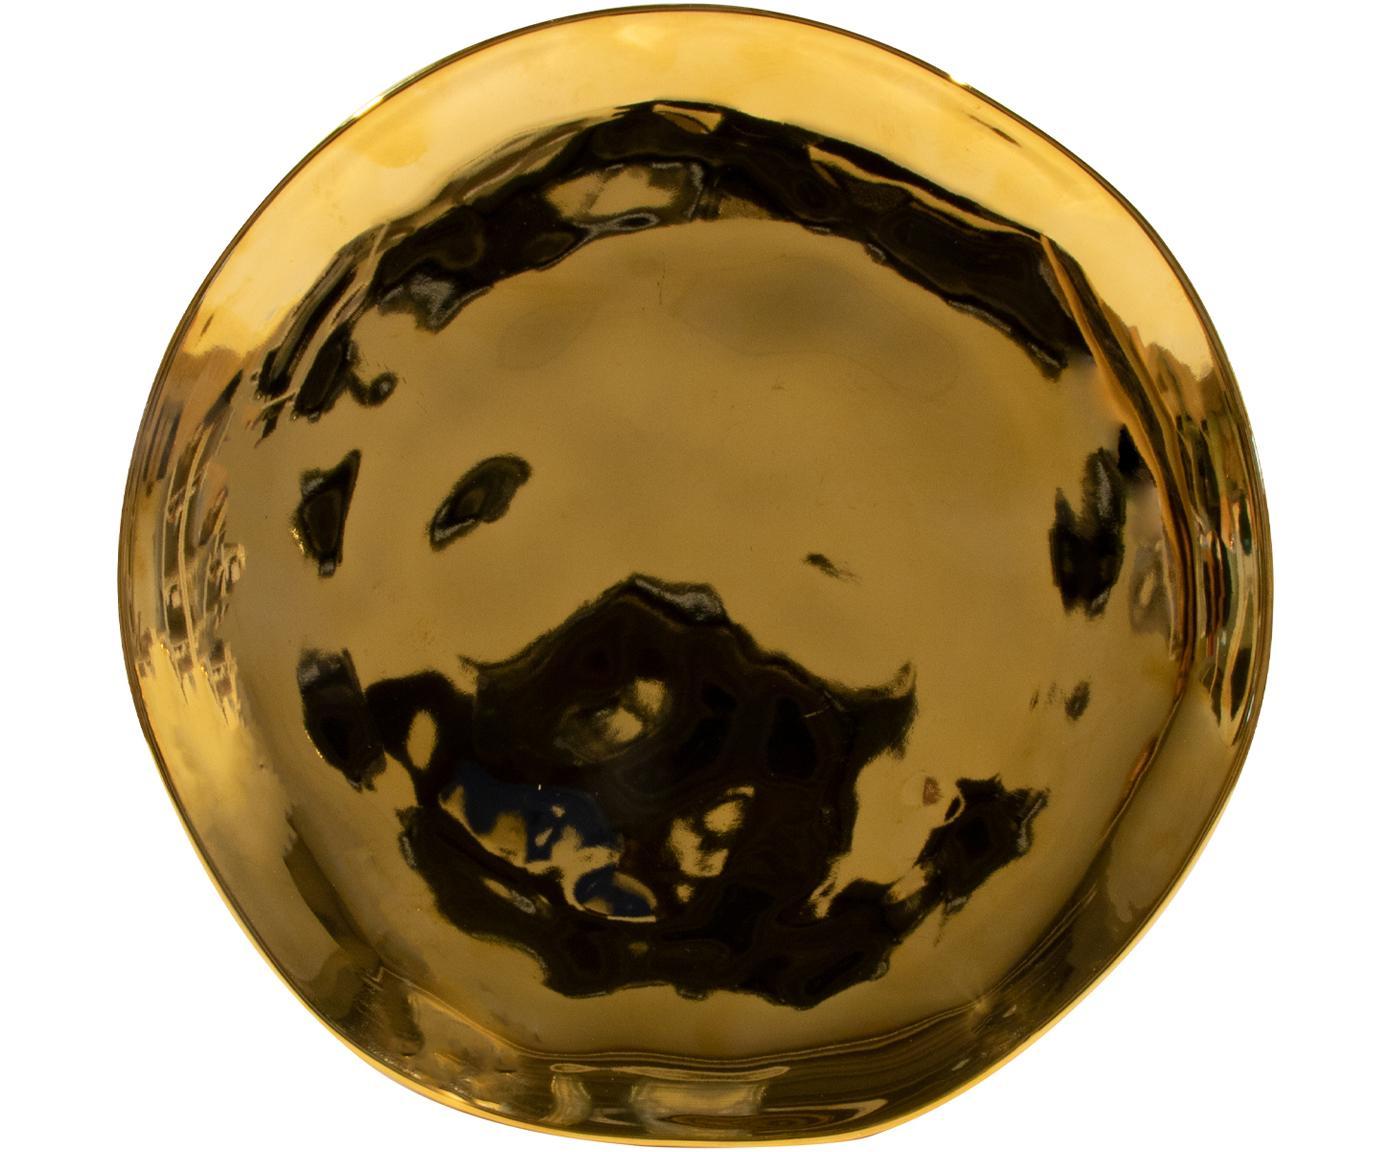 Kuchenteller Good Morning in Gold, Steingut, beschichtet, Goldfarben, Ø 22 cm